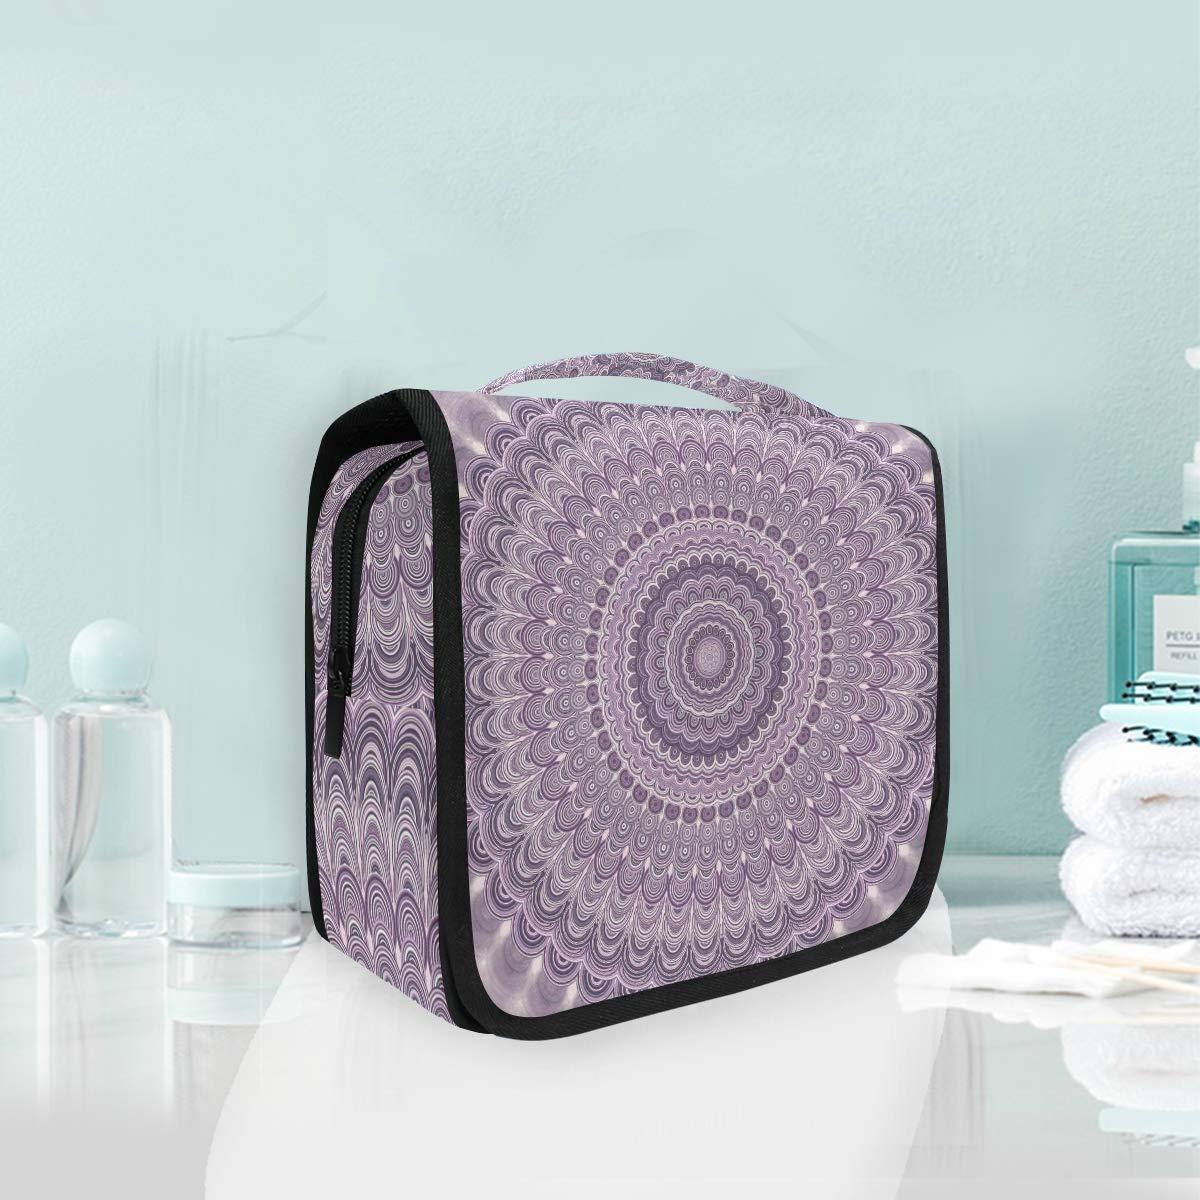 Toiletry Bag Hanging Travel Cosmetic Bag Large Capacity Portable Makeup Bag Light Purple Bohemian Organizer Pouch for Women Girls